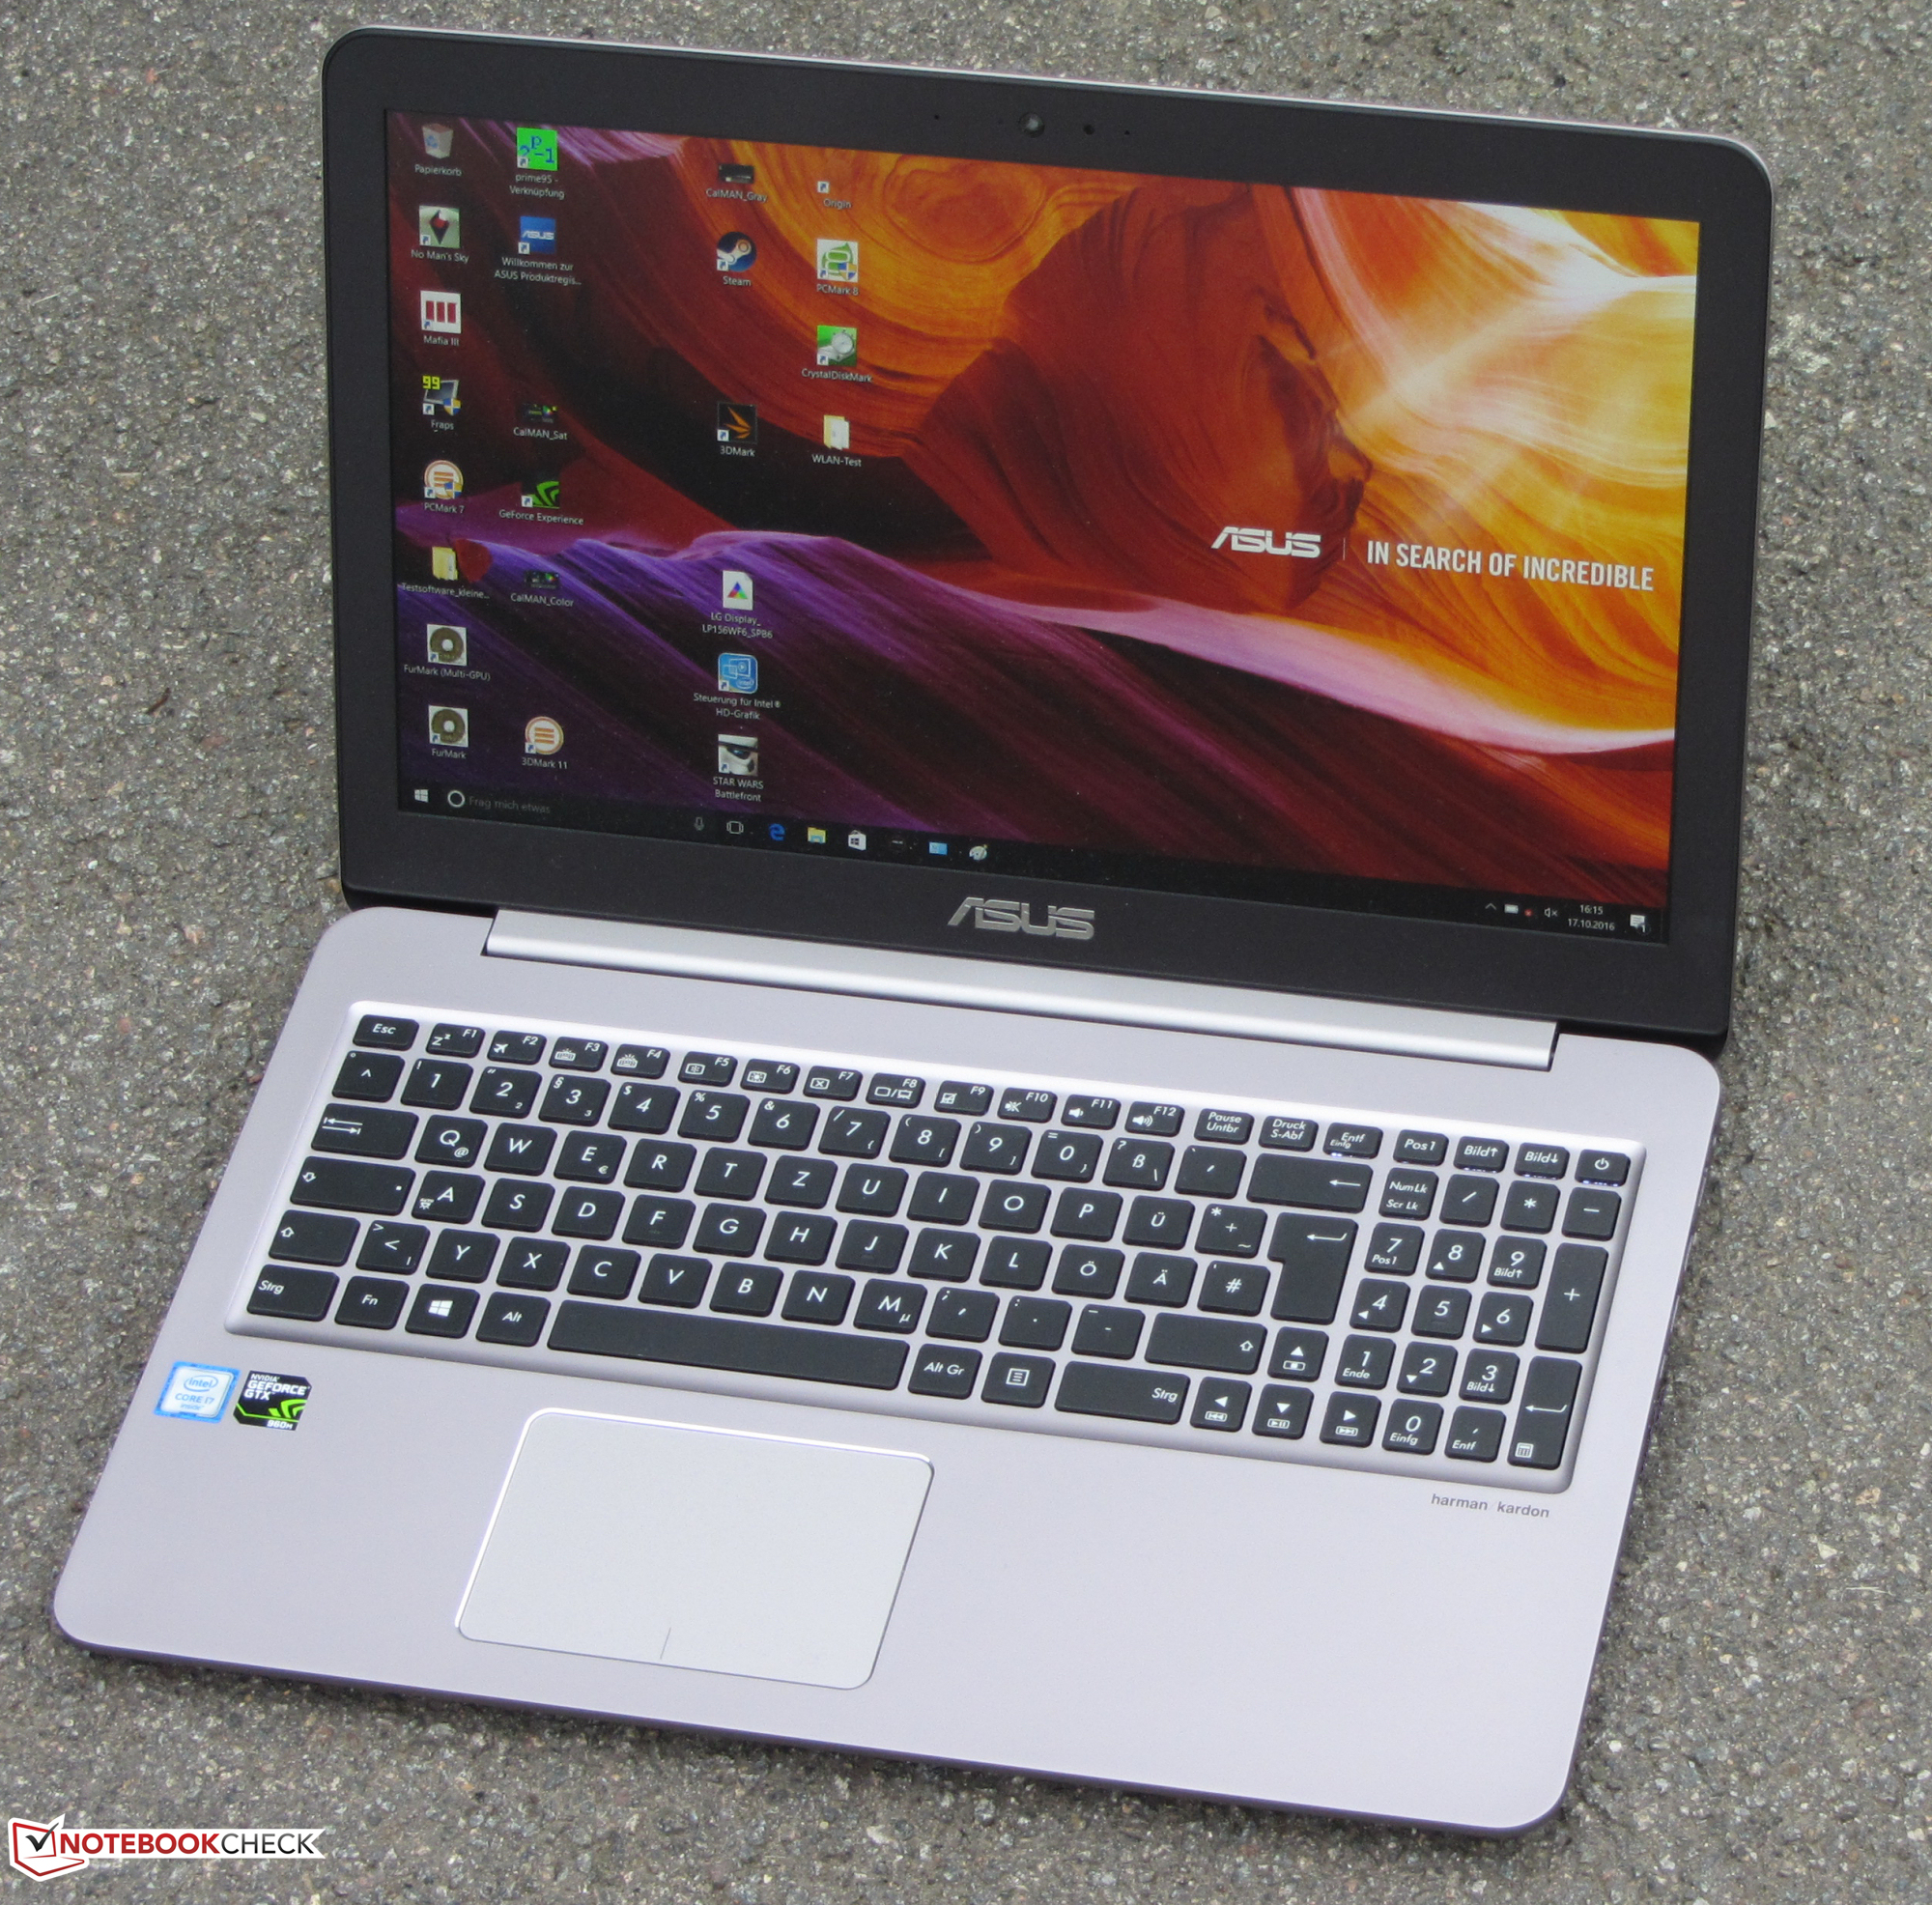 harman kardon laptop. Full Resolution Harman Kardon Laptop A